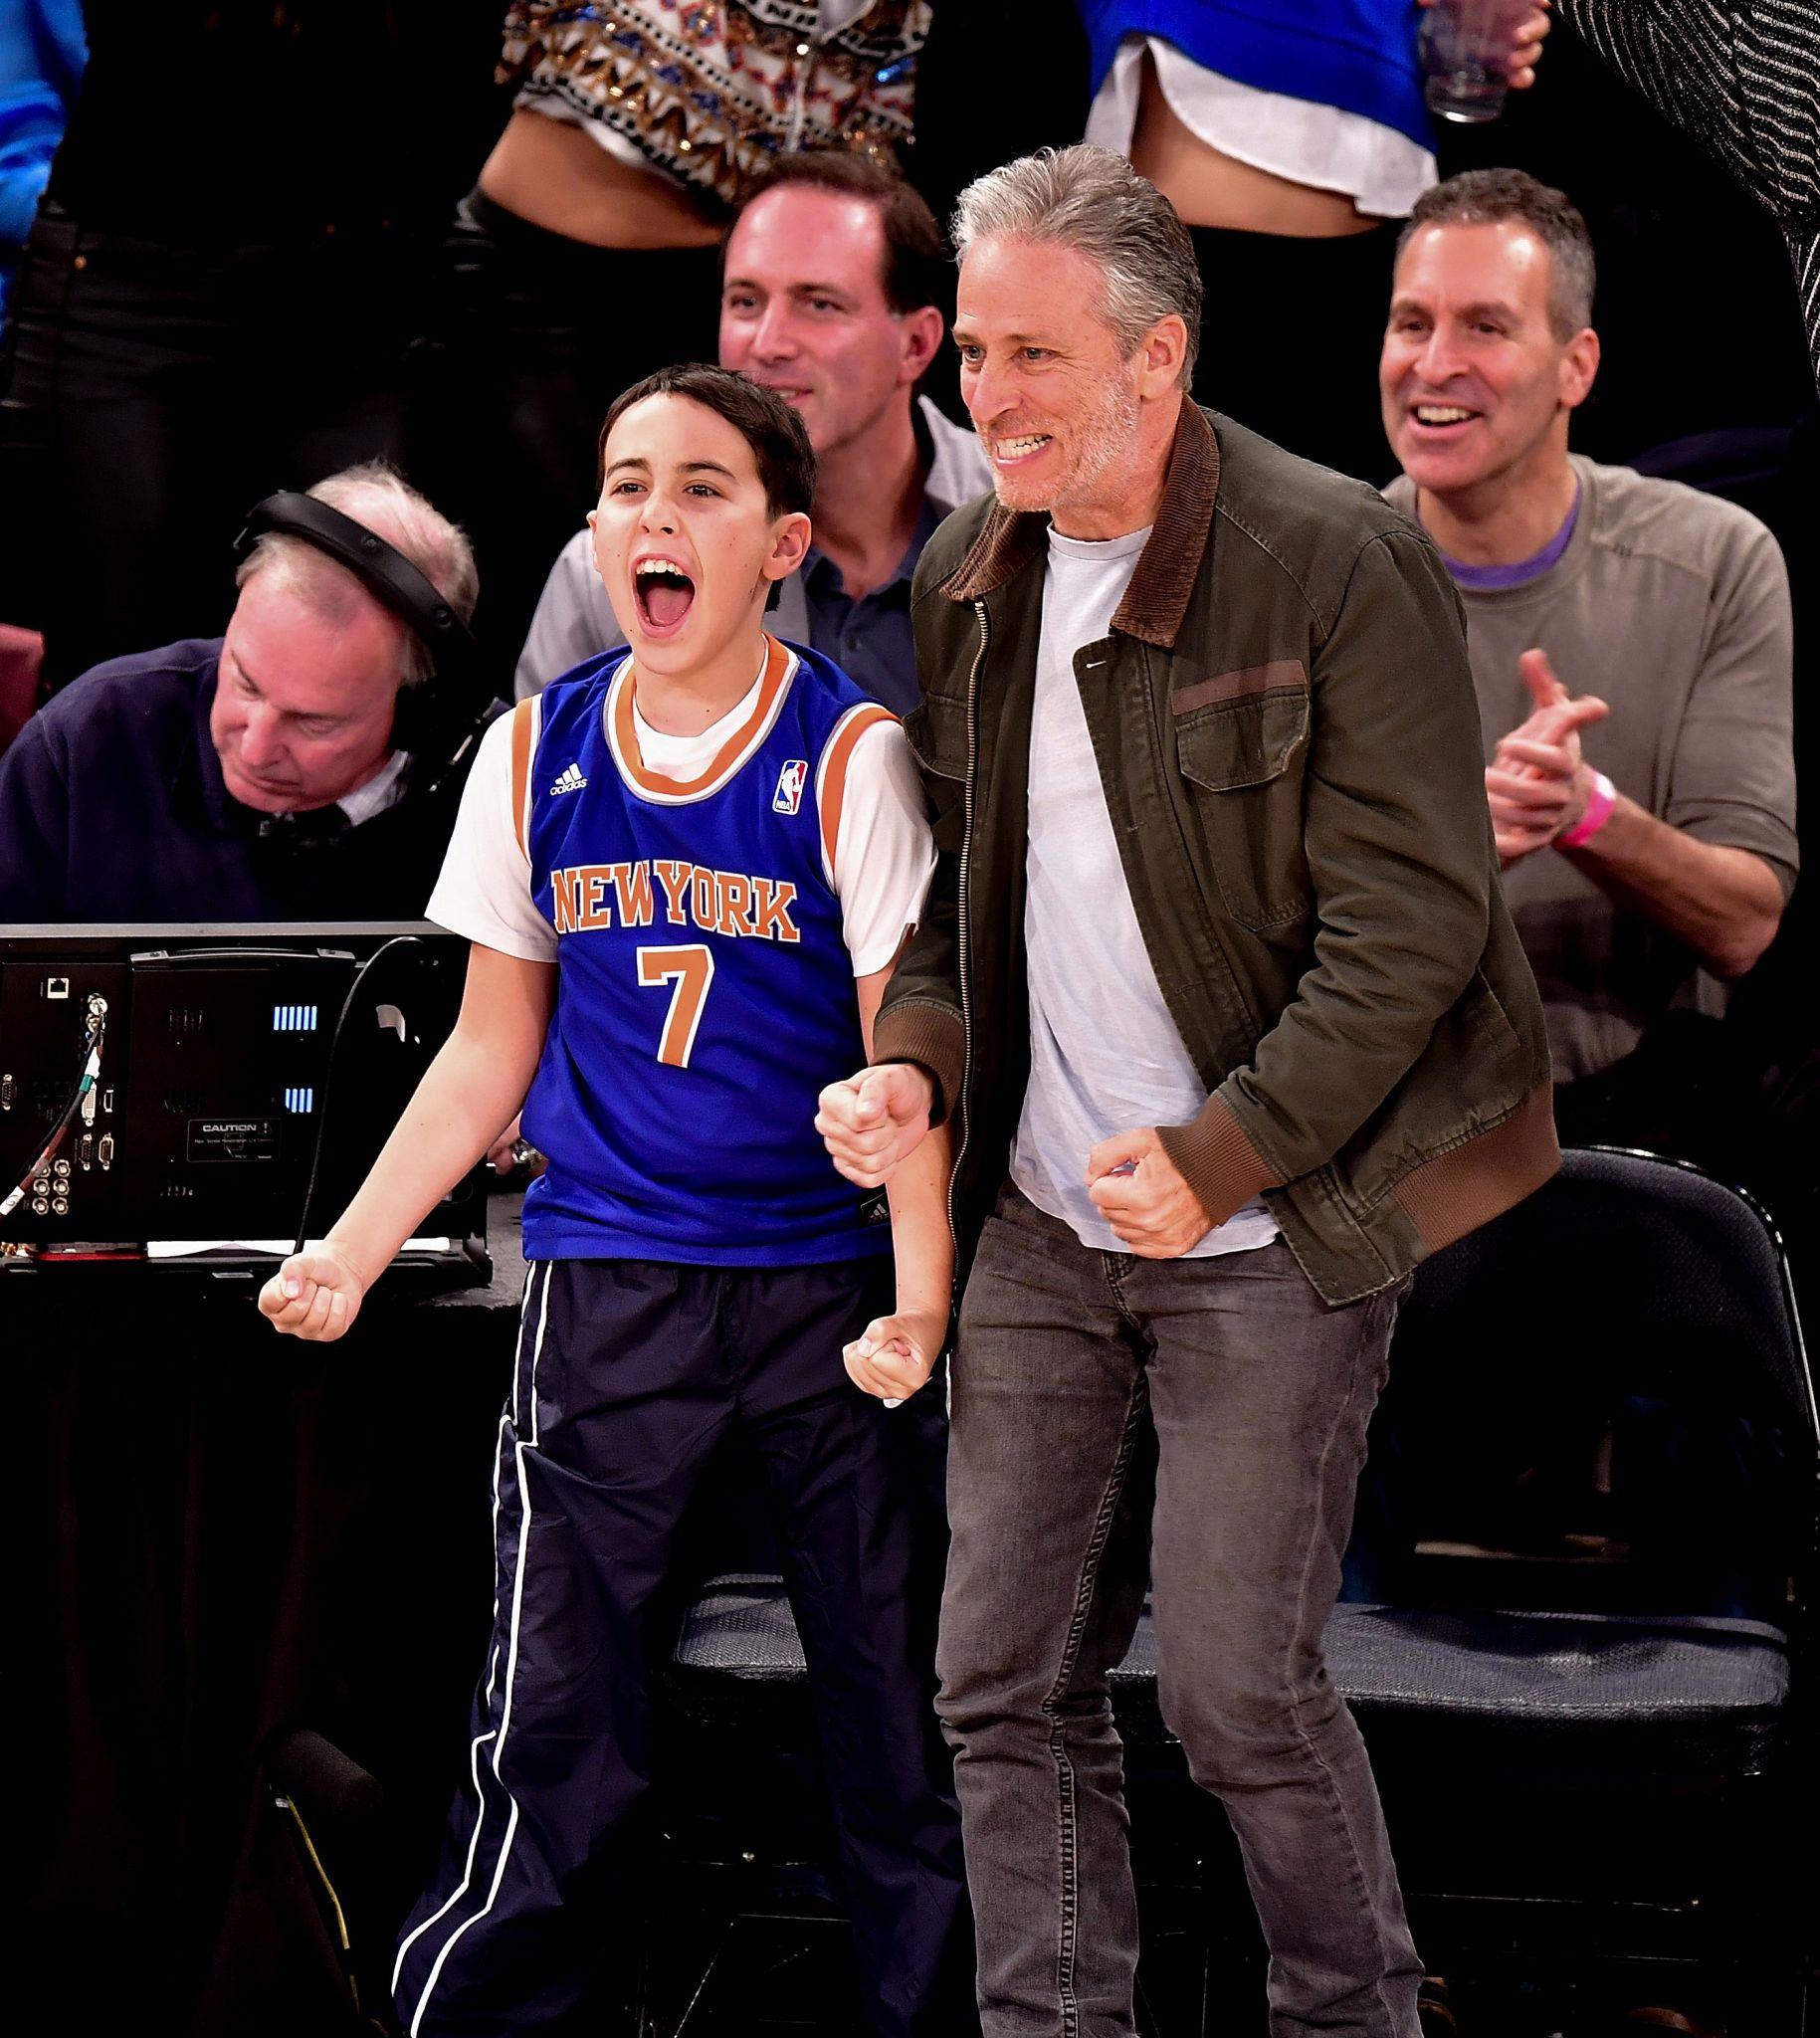 Madison Square Garden: Celebrities Sit Courtside At Madison Square Garden To Root